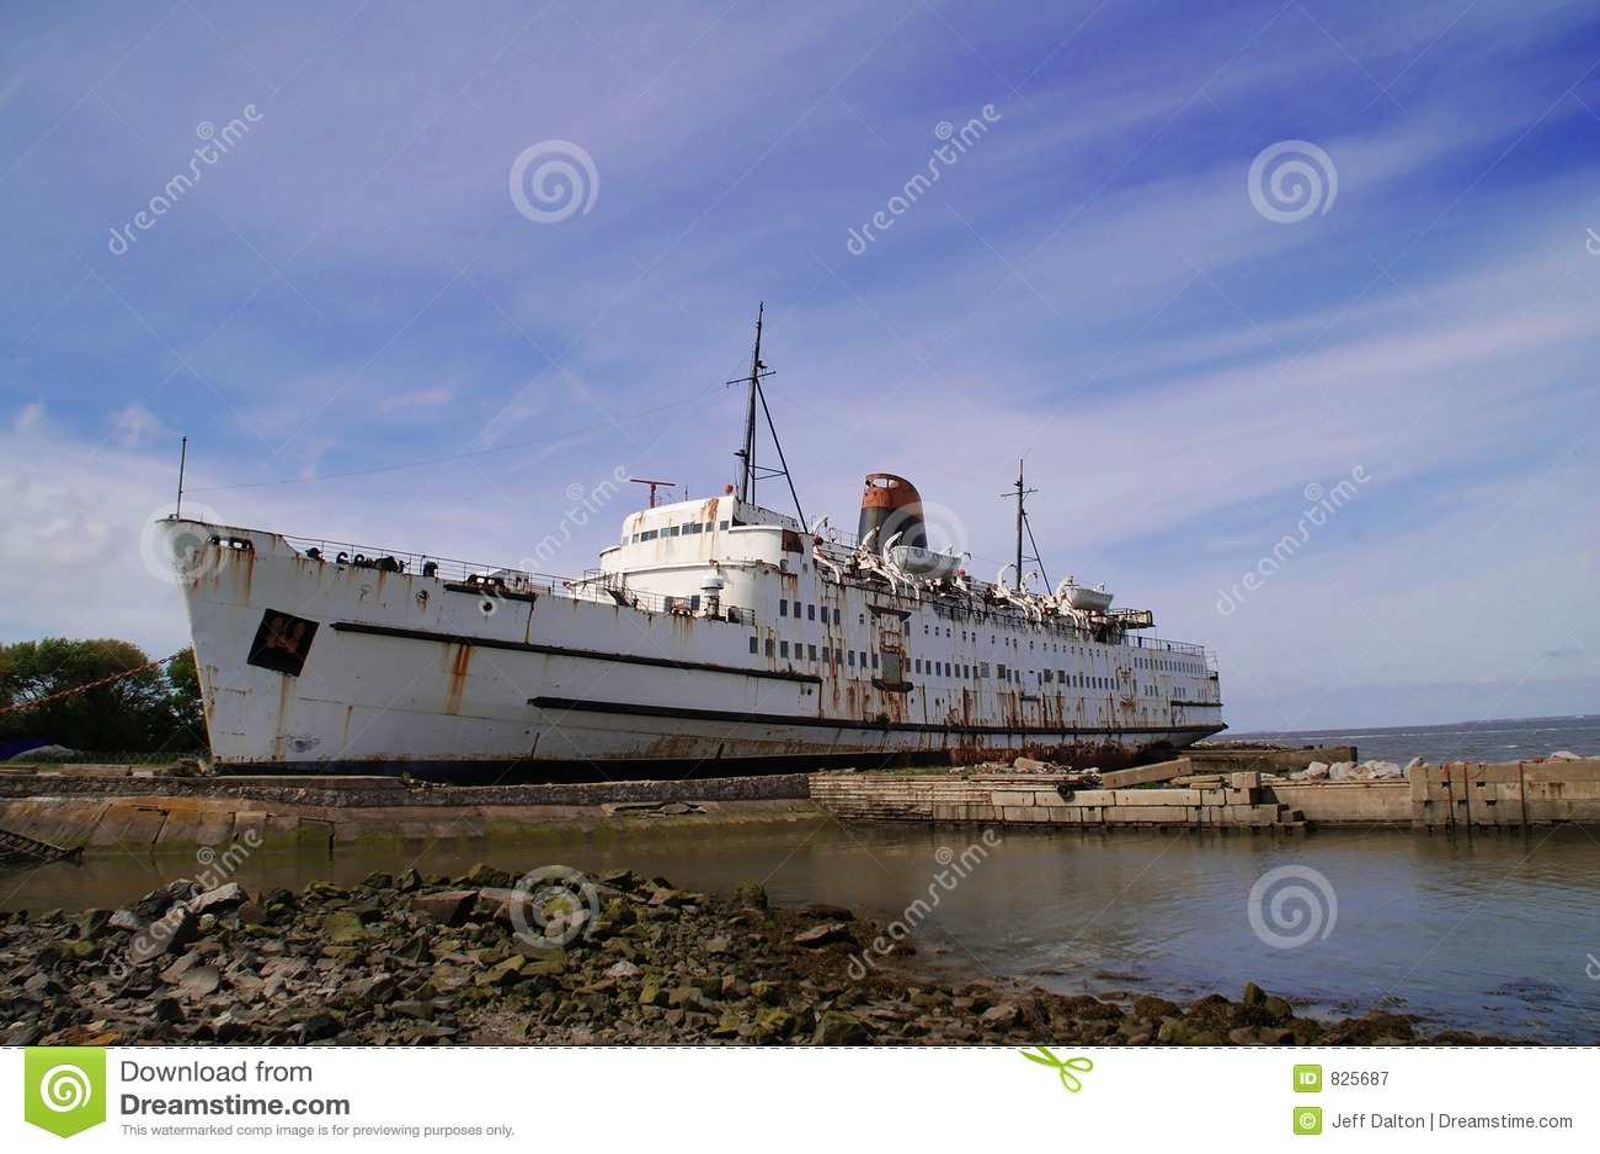 Rusting old passenger ship